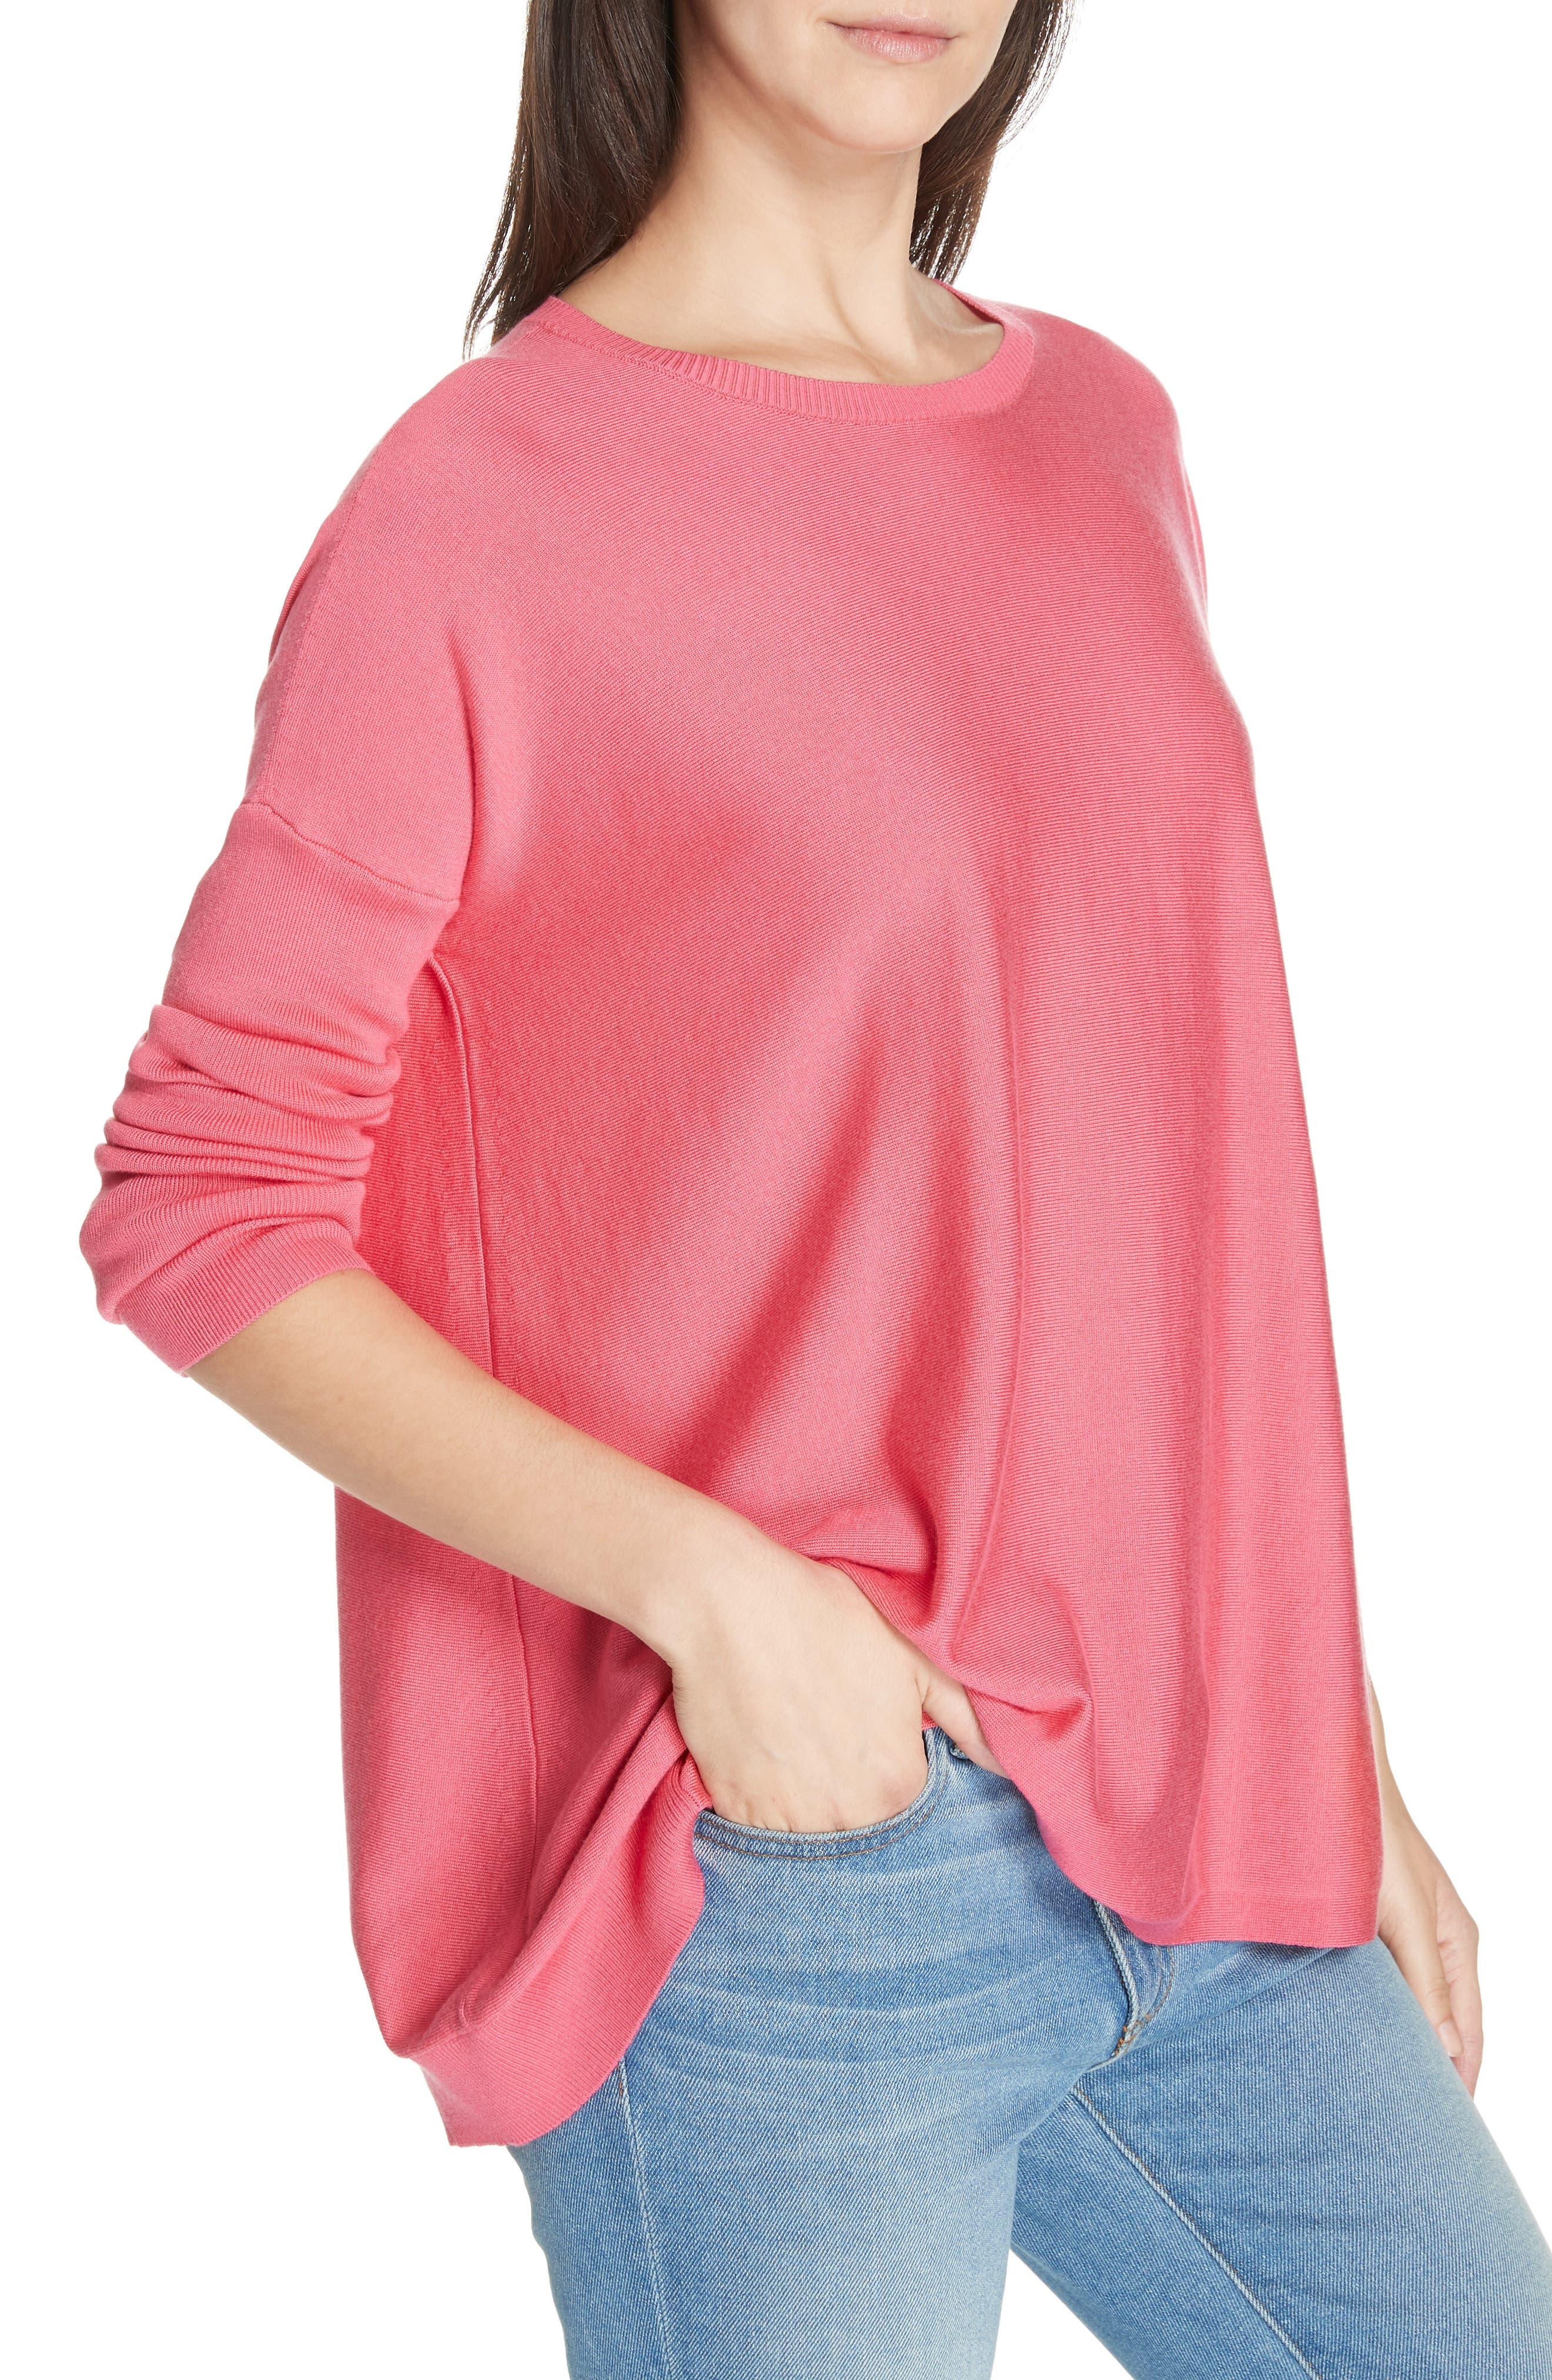 Tencel<sup>®</sup> Lyocell Blend Sweater,                             Alternate thumbnail 4, color,                             CHERRY LANE